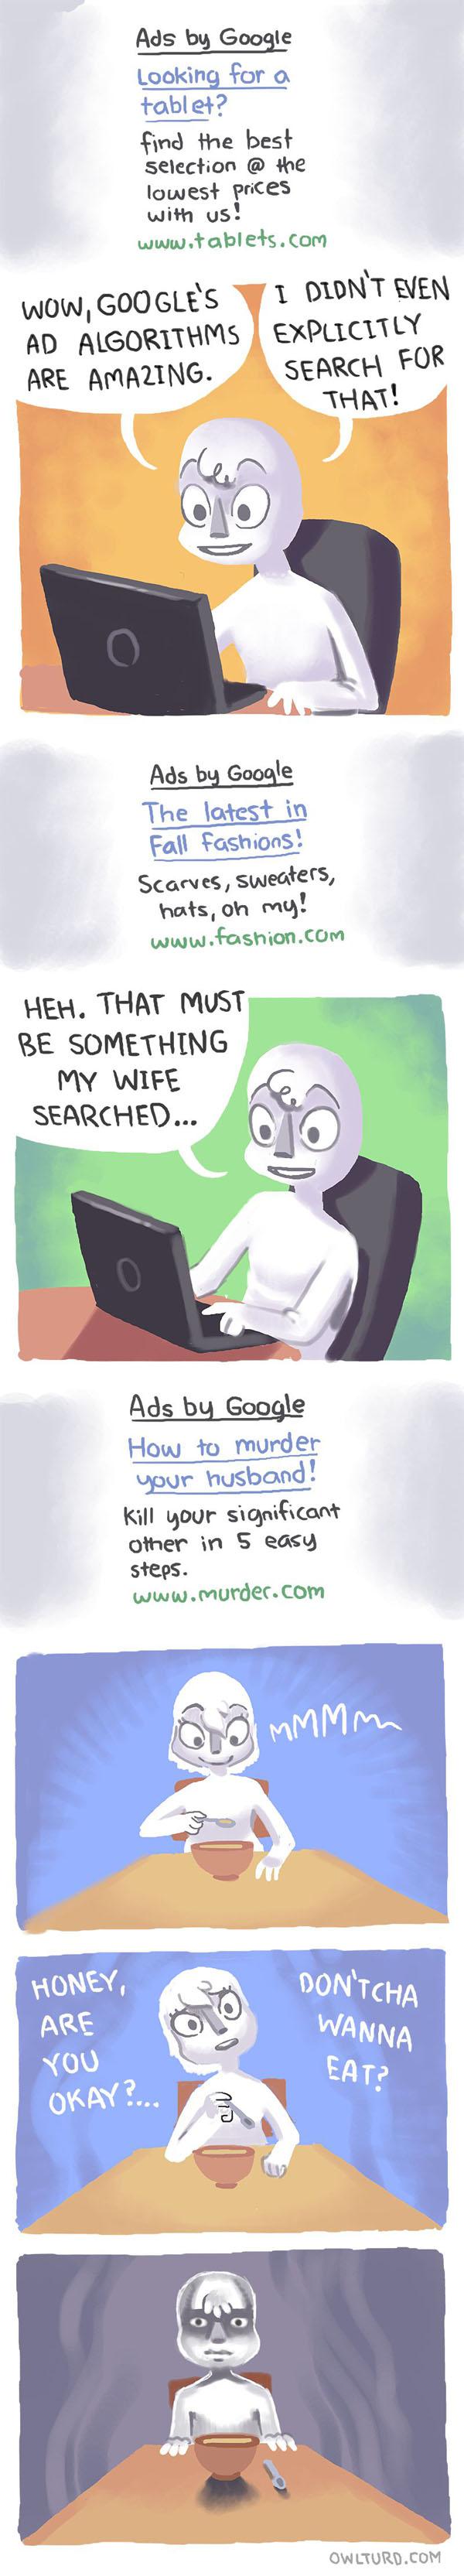 Google Adverts